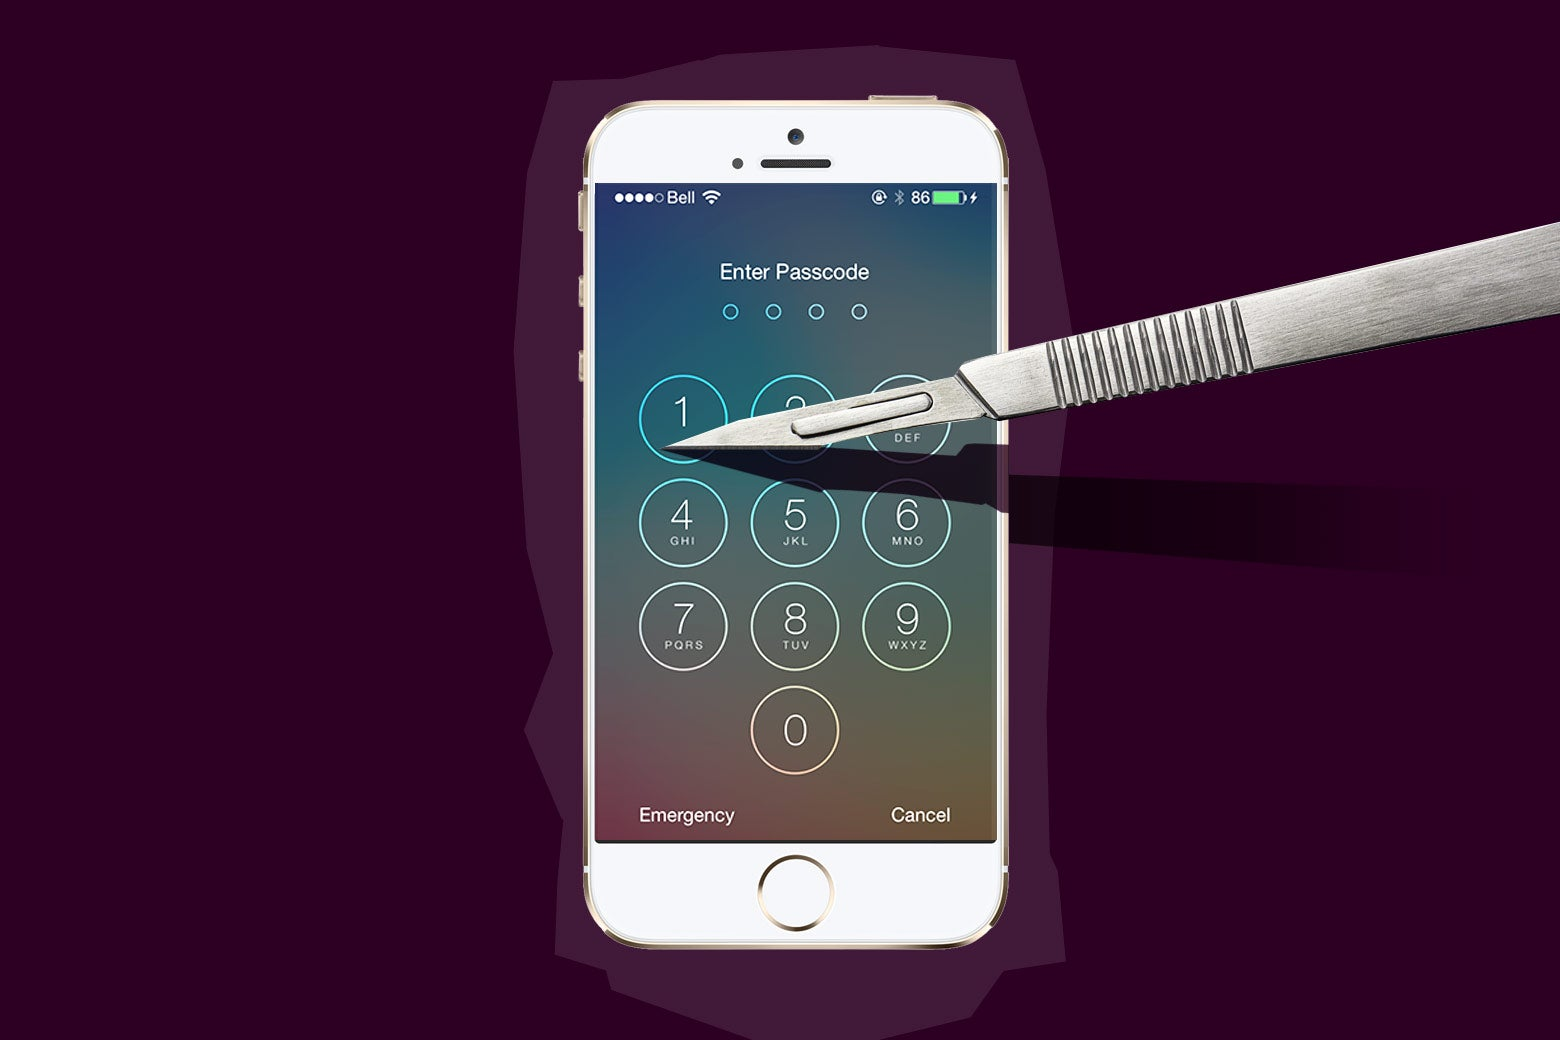 Scalpel and iPhone unlock screen.